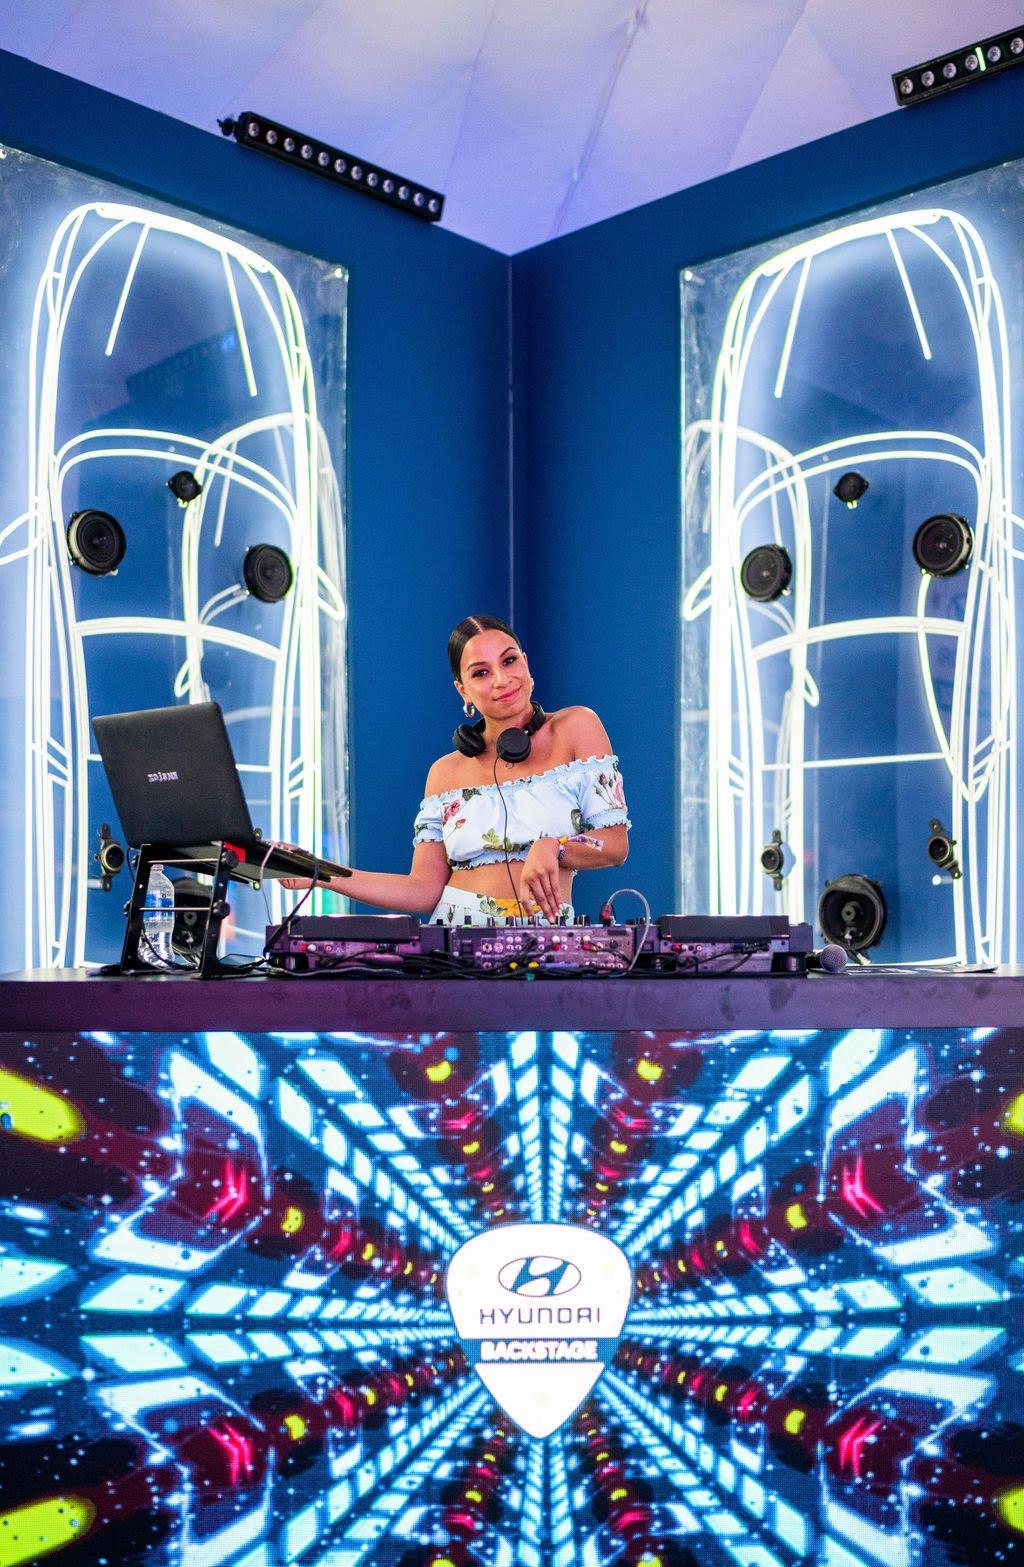 lightup DJ booth